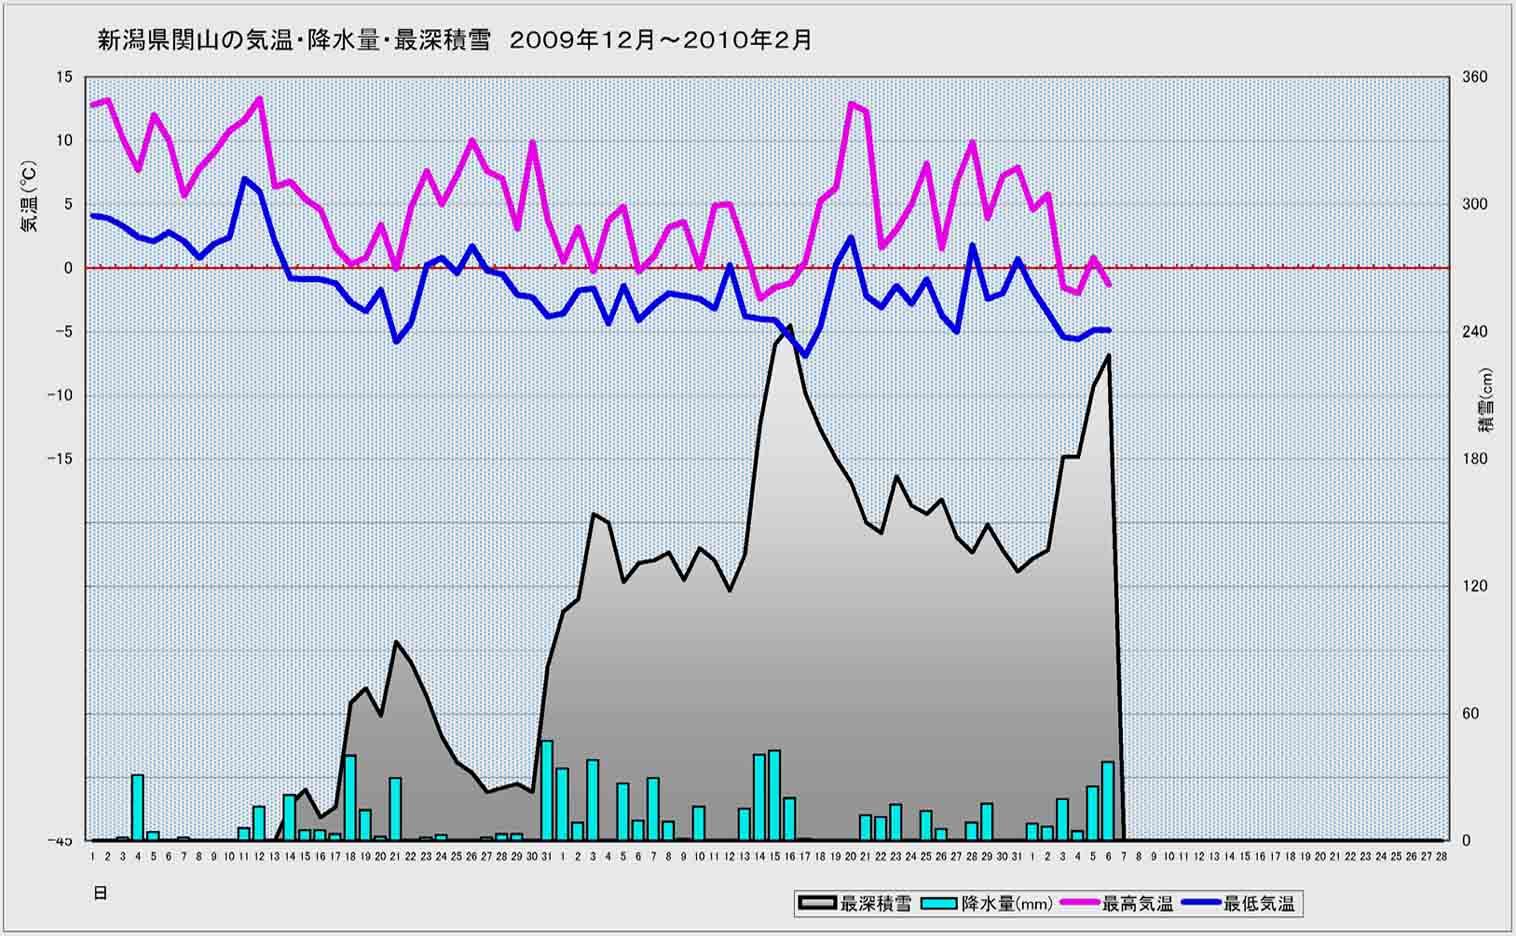 D地点(関山)の2009年12月~今年2月6日まで